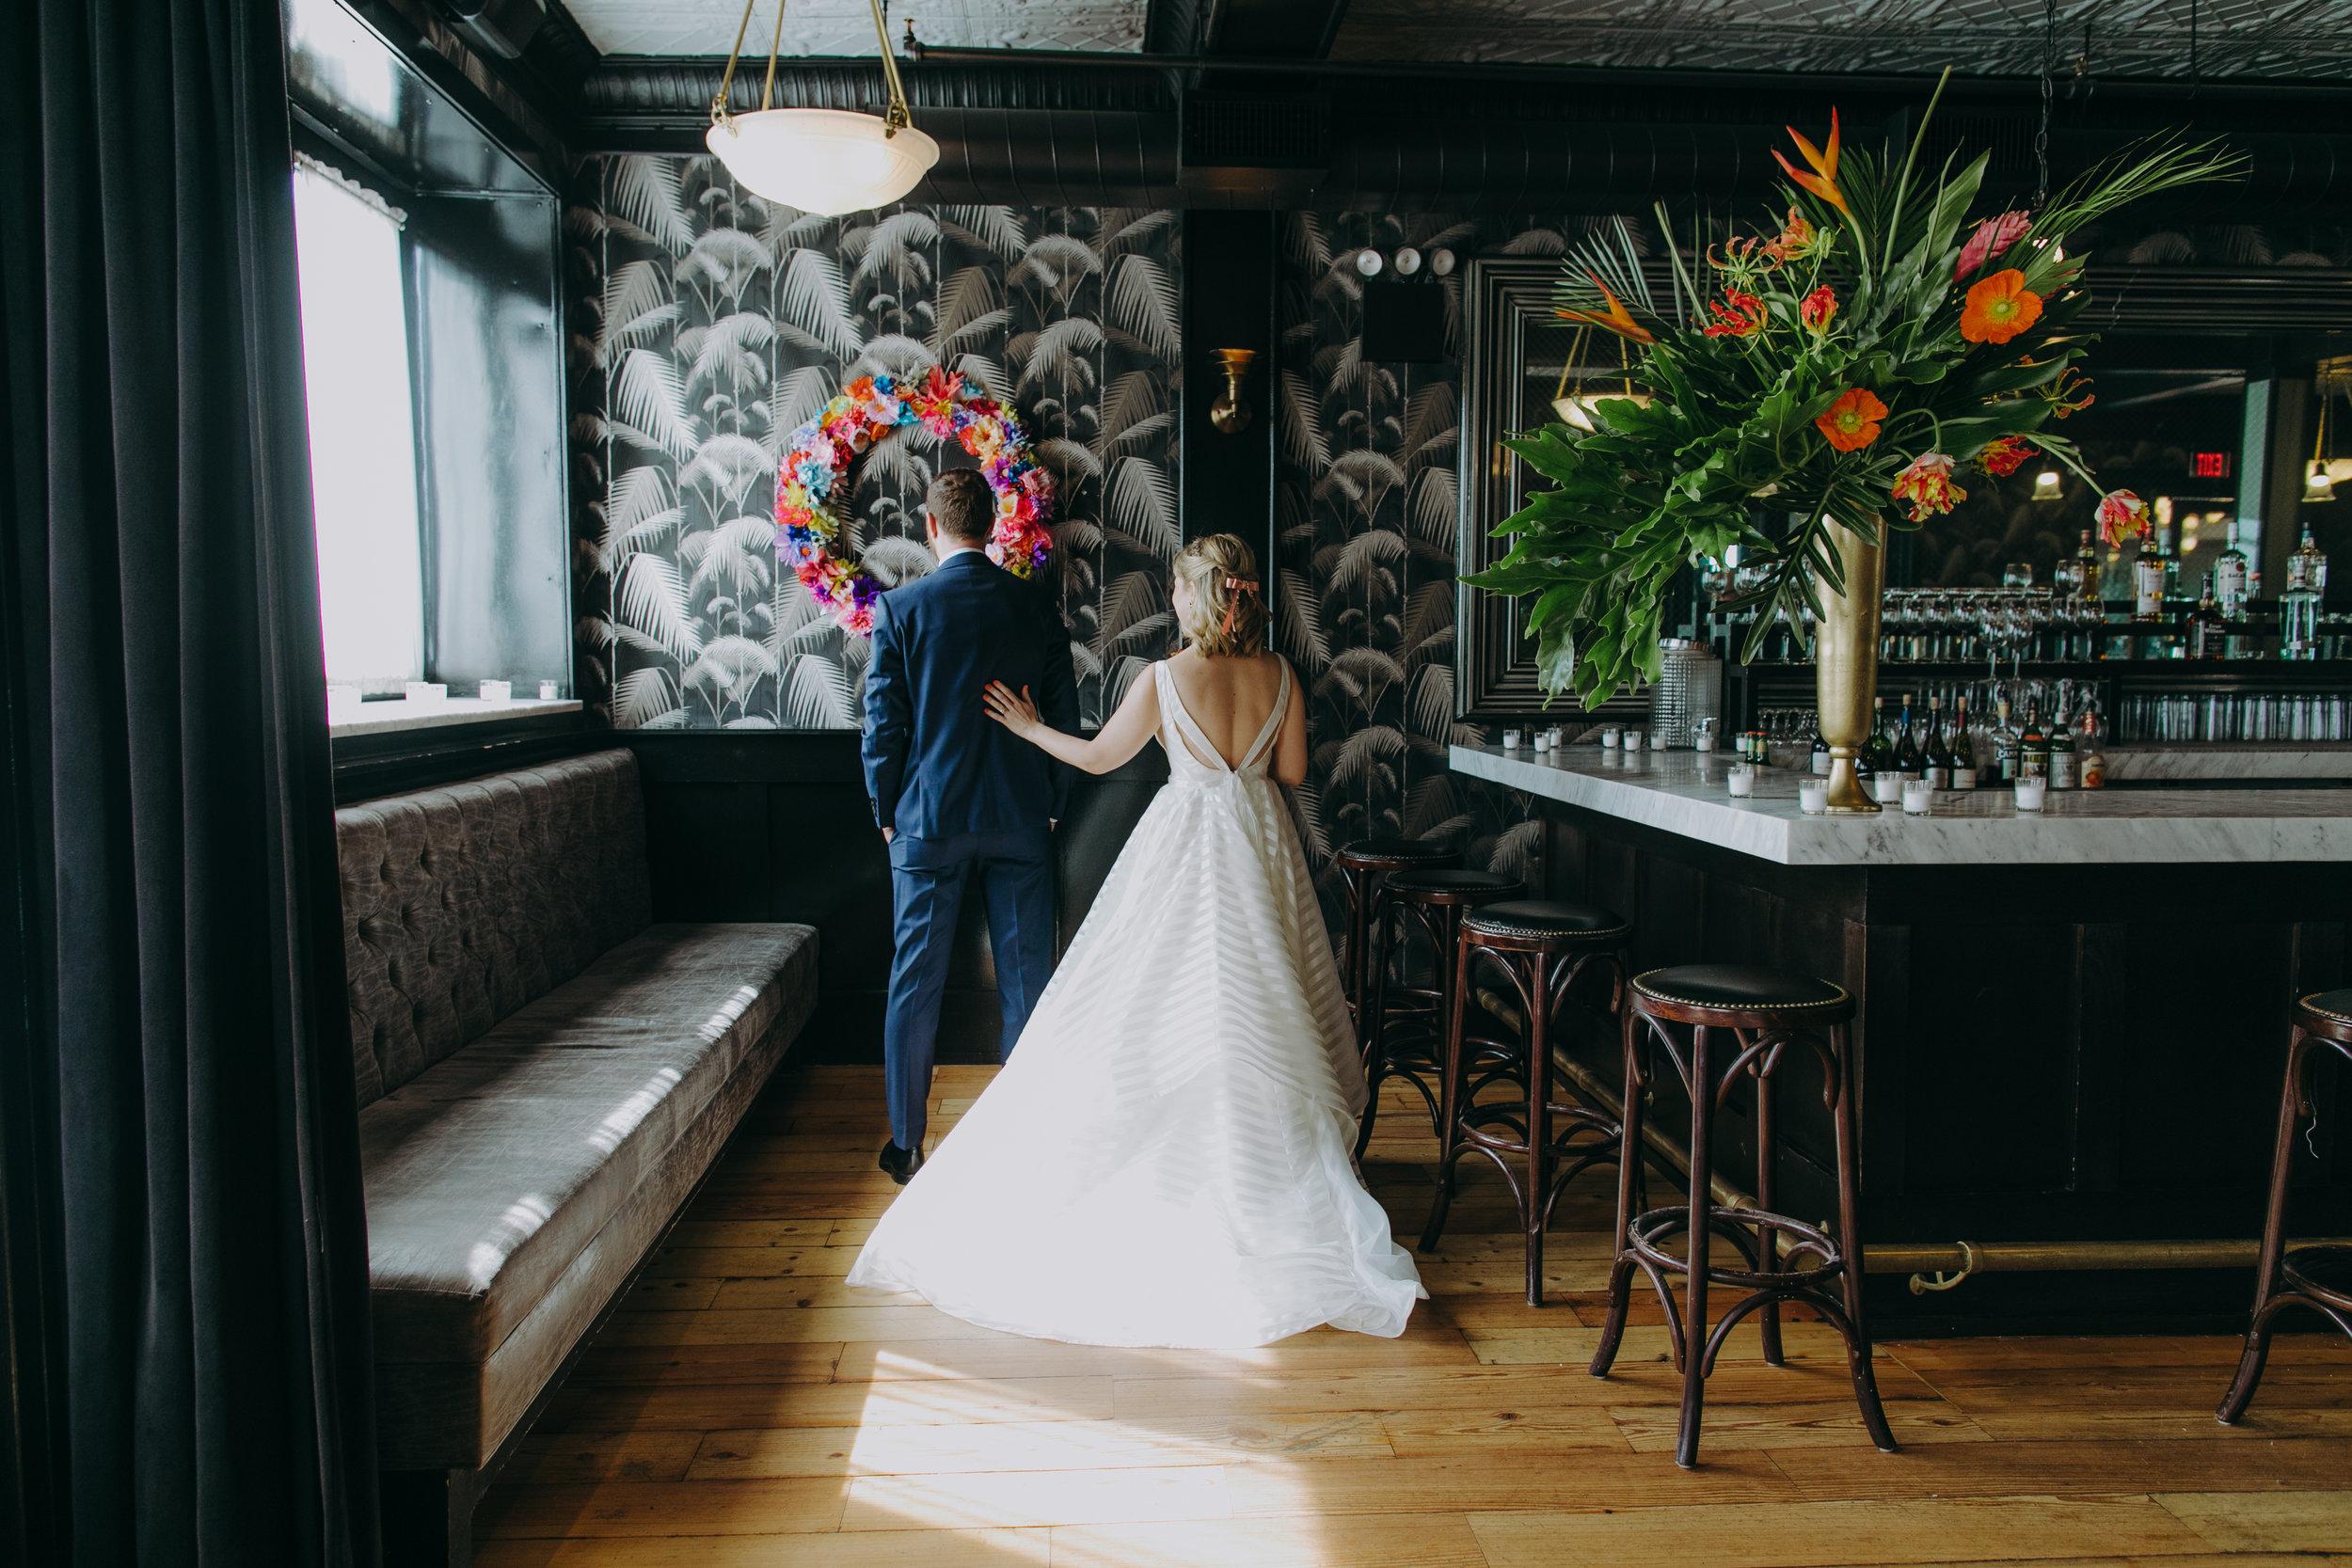 501-union-wedding-photographer-amber-gress-0080.jpg